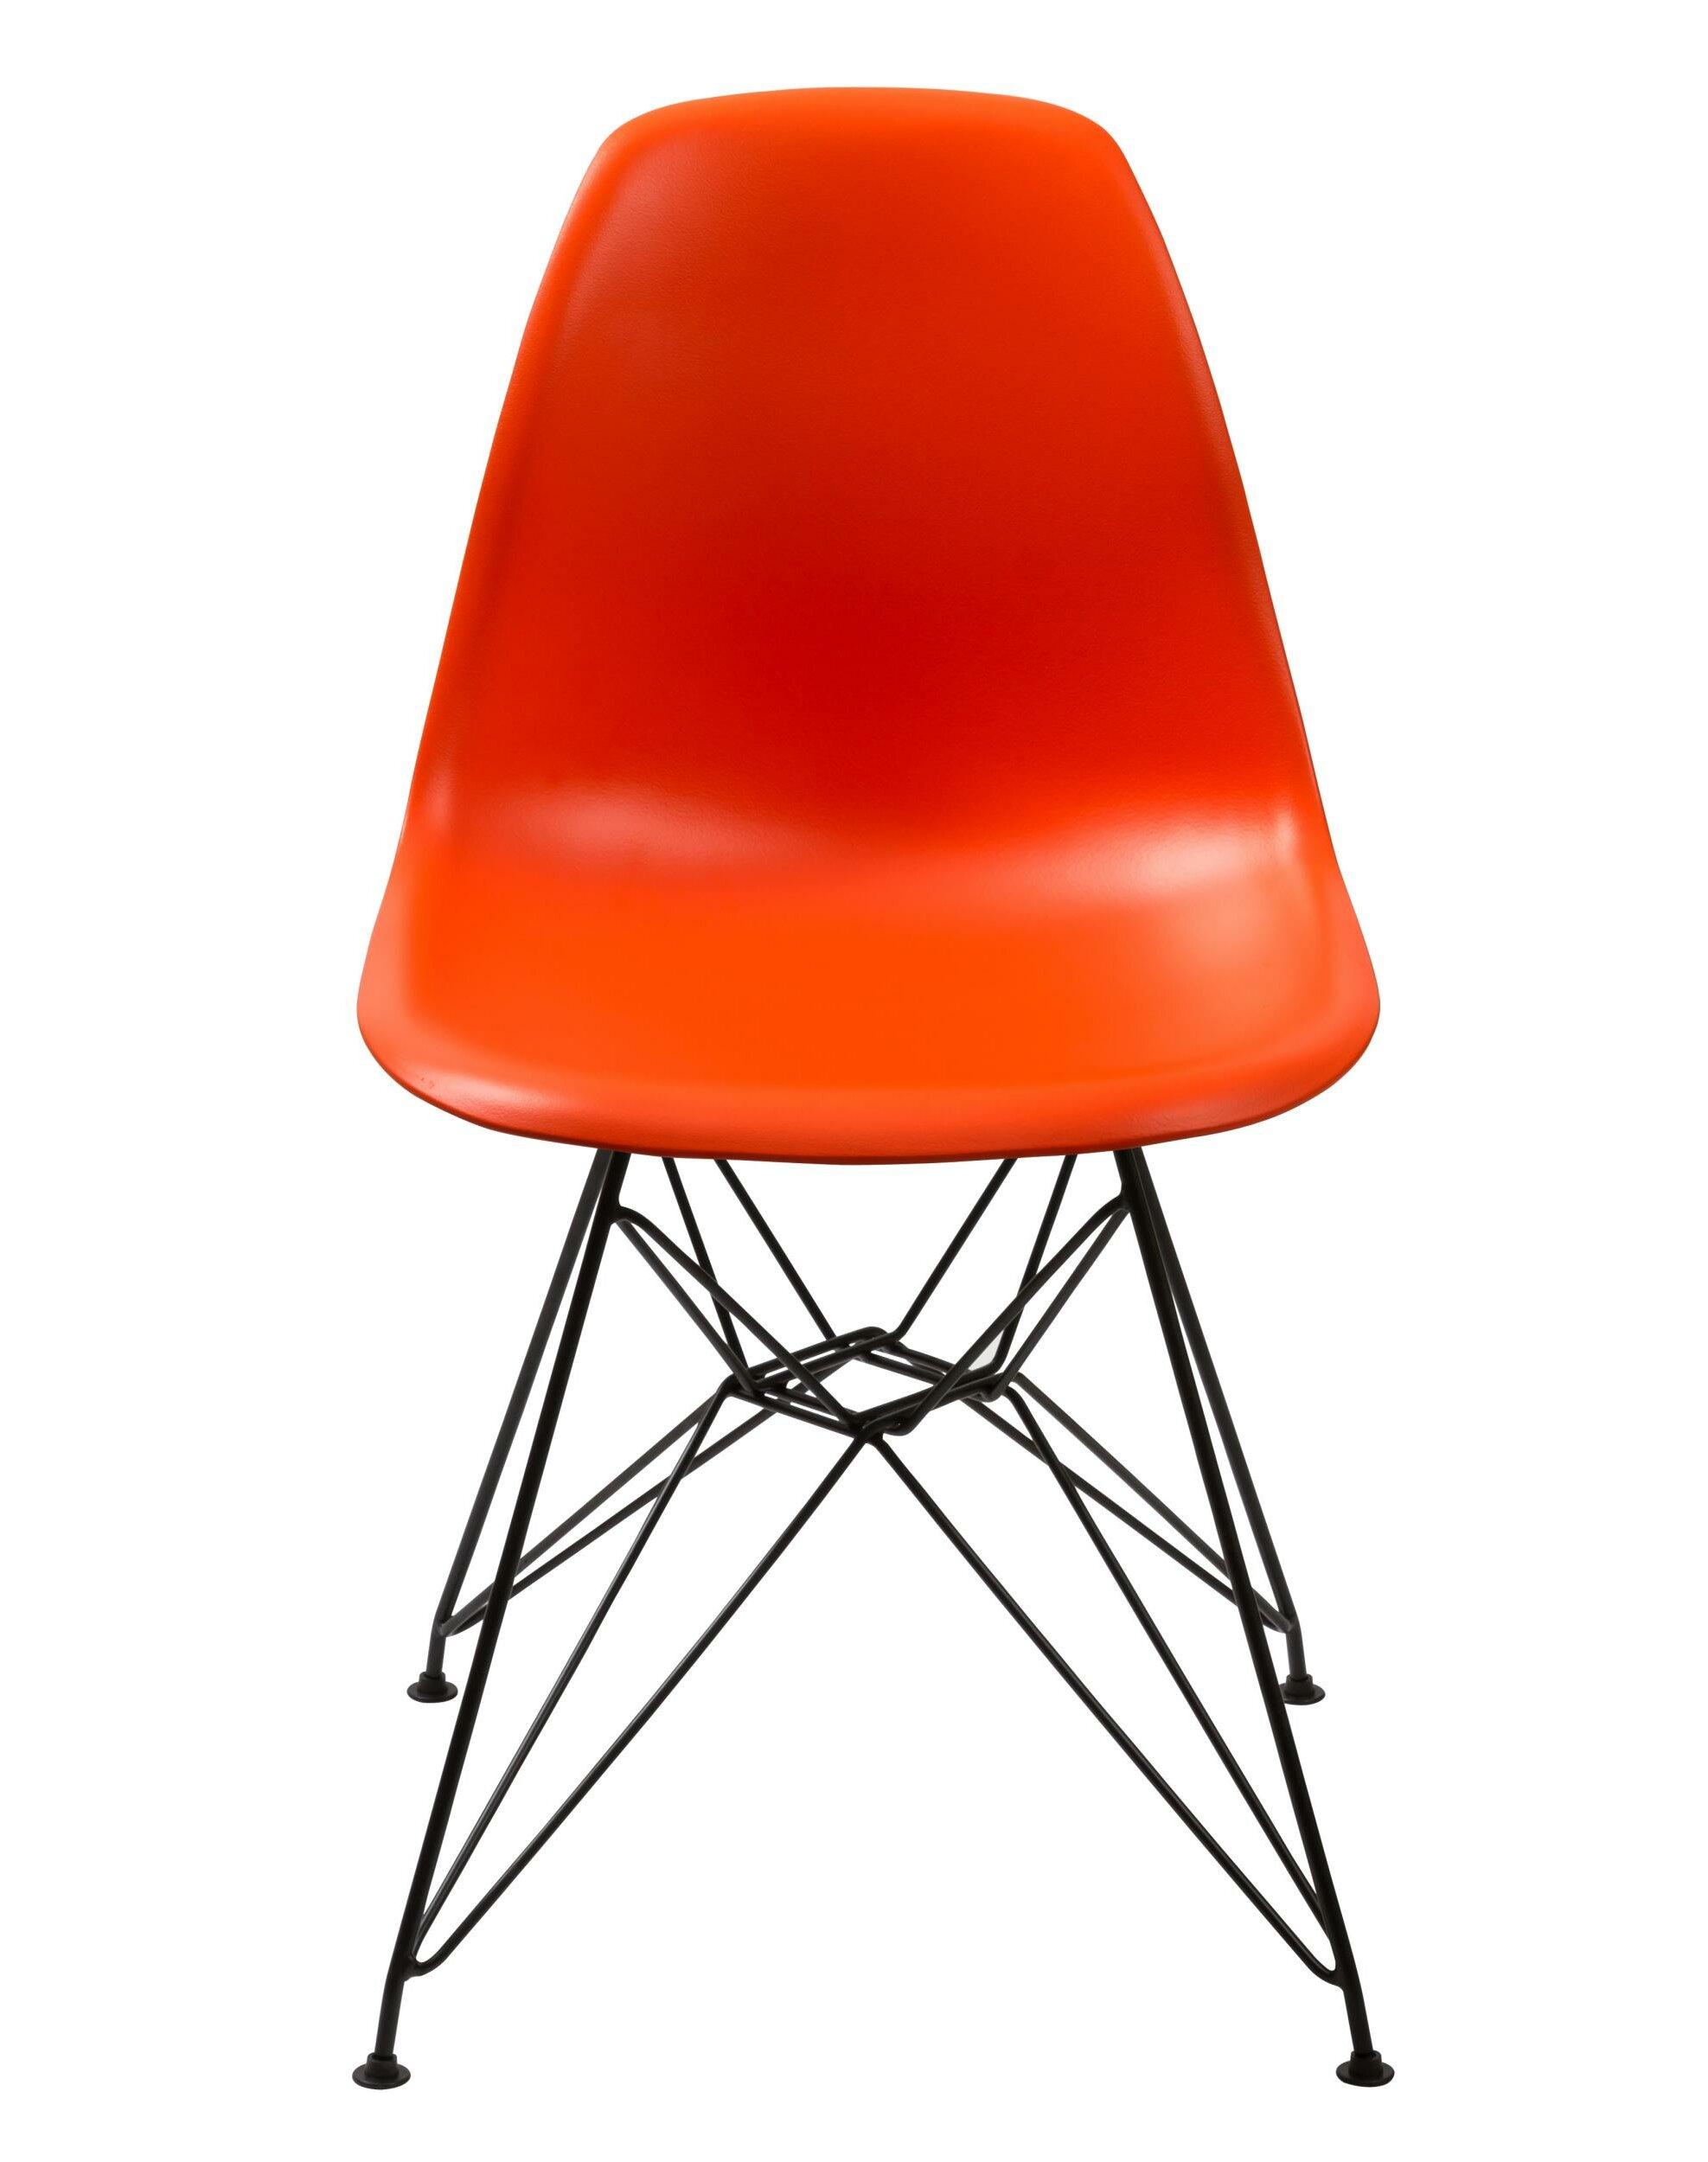 Incredible Ordway Deep Back Dining Chair Spiritservingveterans Wood Chair Design Ideas Spiritservingveteransorg